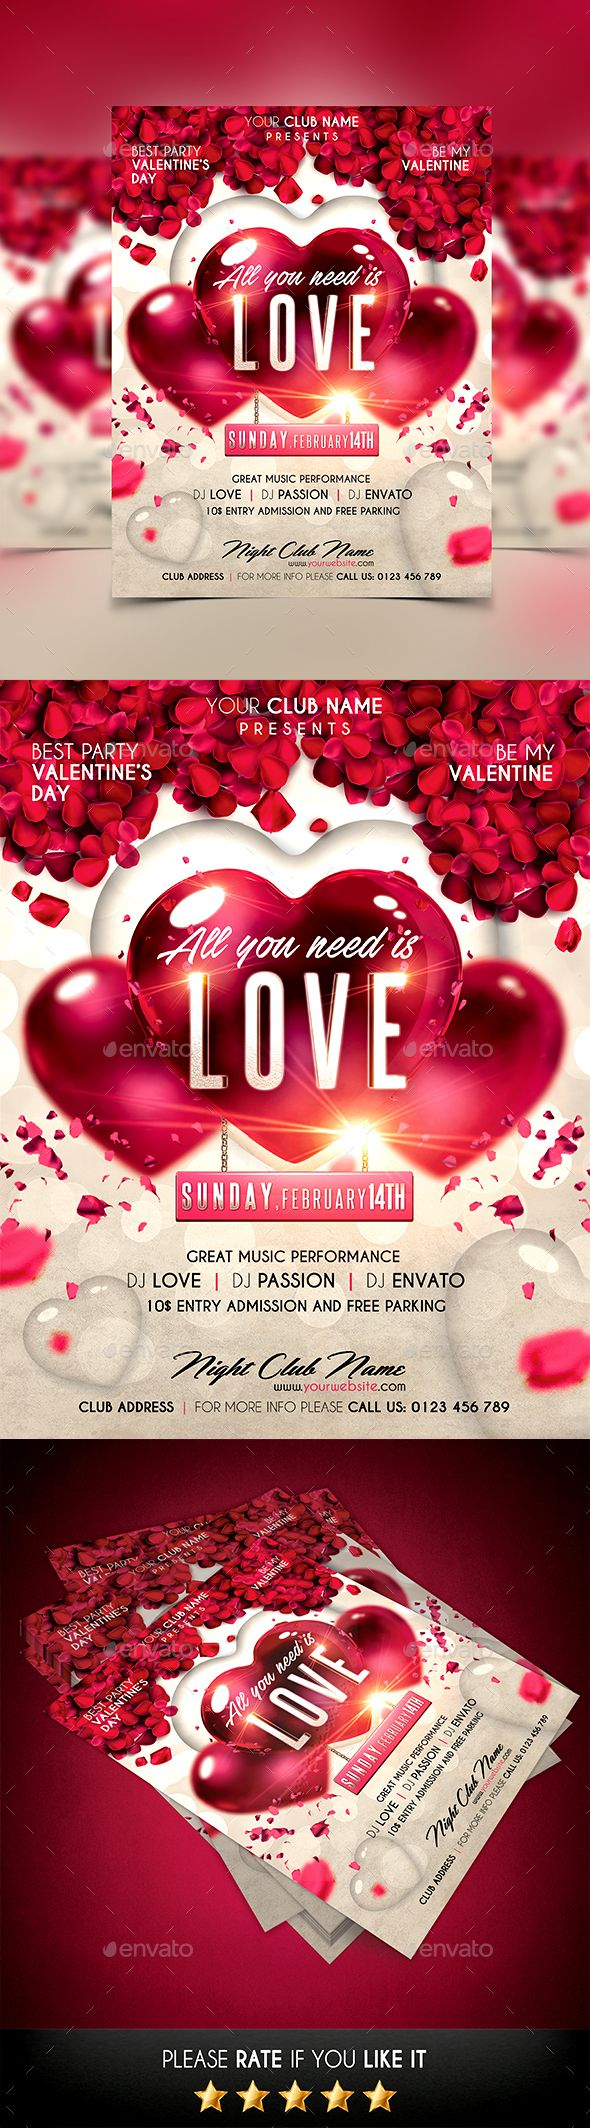 Valentines Day Flyer Template PSD #design Download: http://graphicriver.net/item/valentines-day-flyer/14428405?ref=ksioks